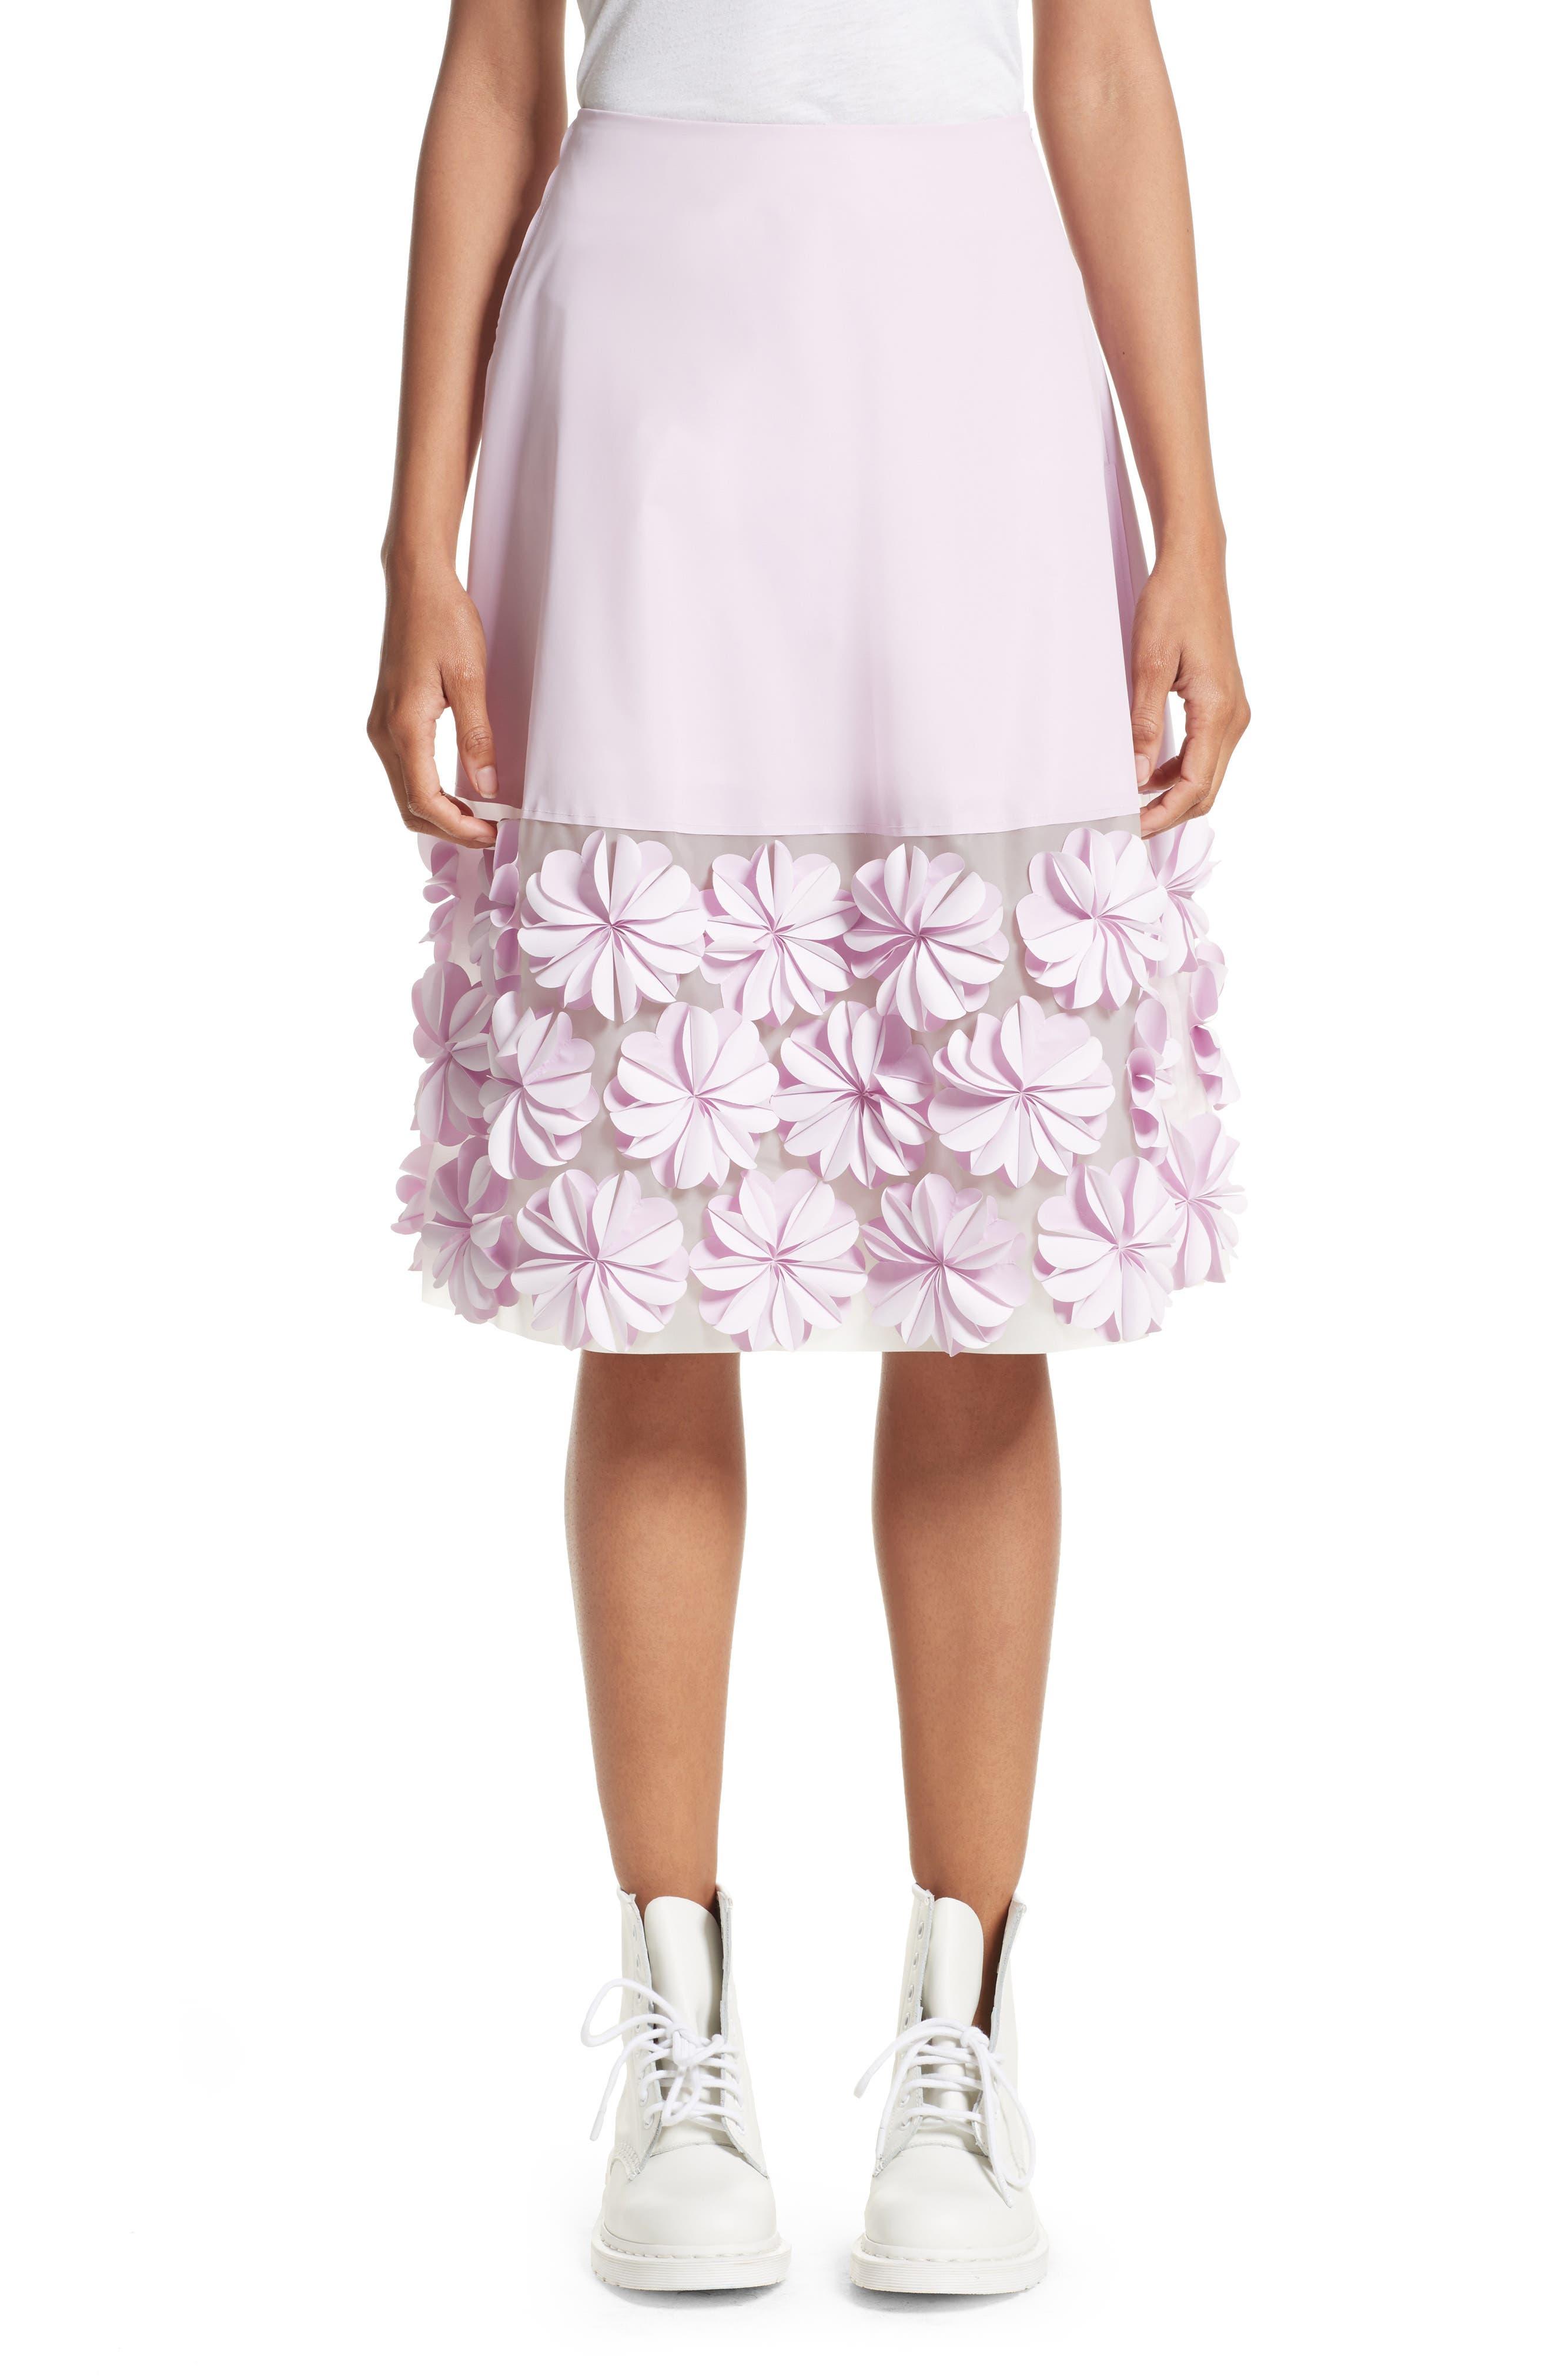 Alternate Image 1 Selected - PASKAL Reflective Floral Appliqué Skirt